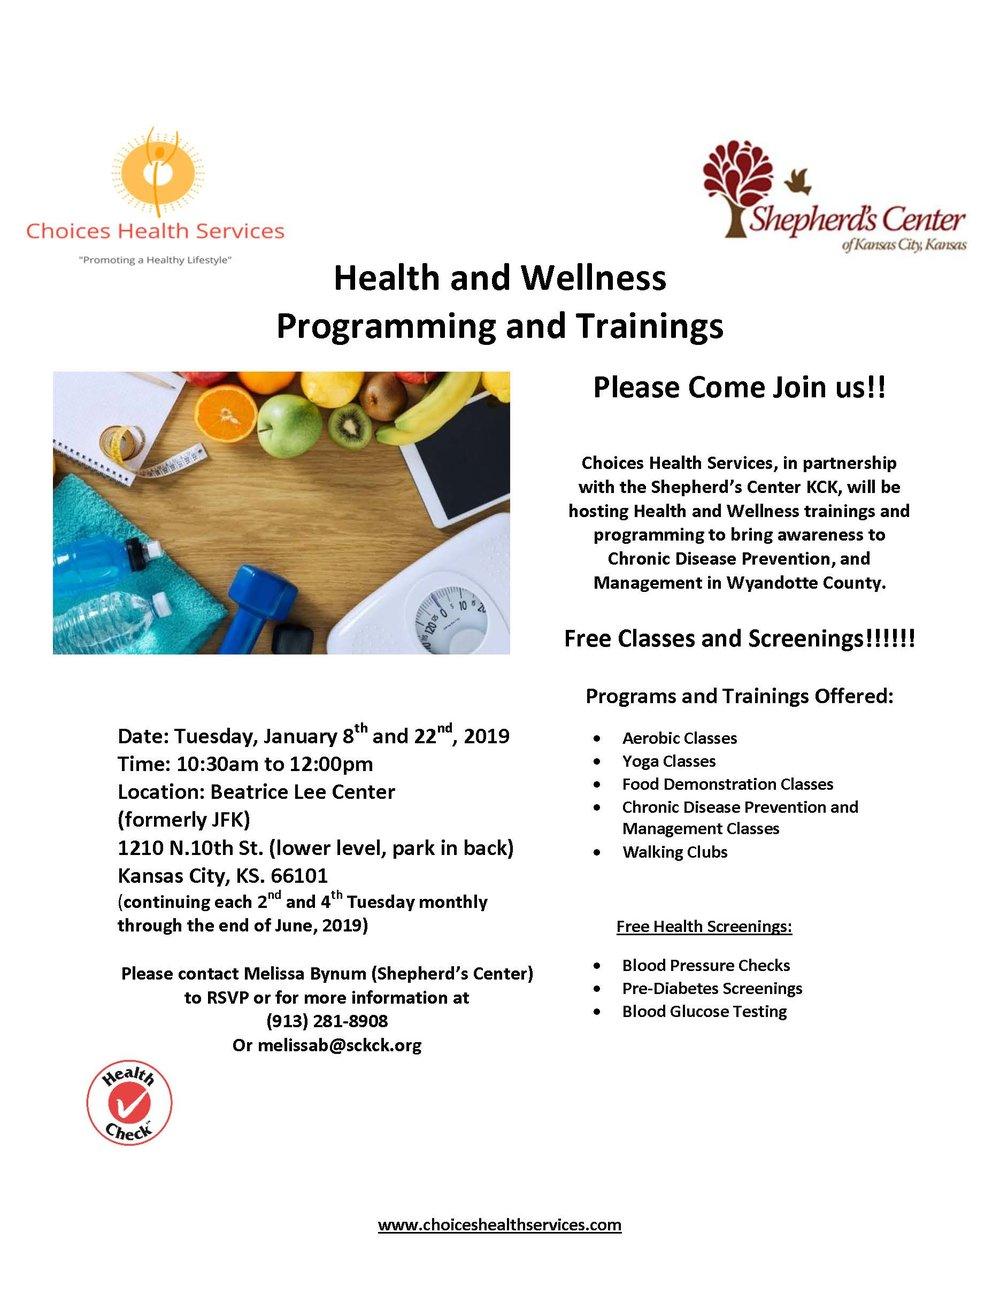 Health and Wellness in KCK.jpg